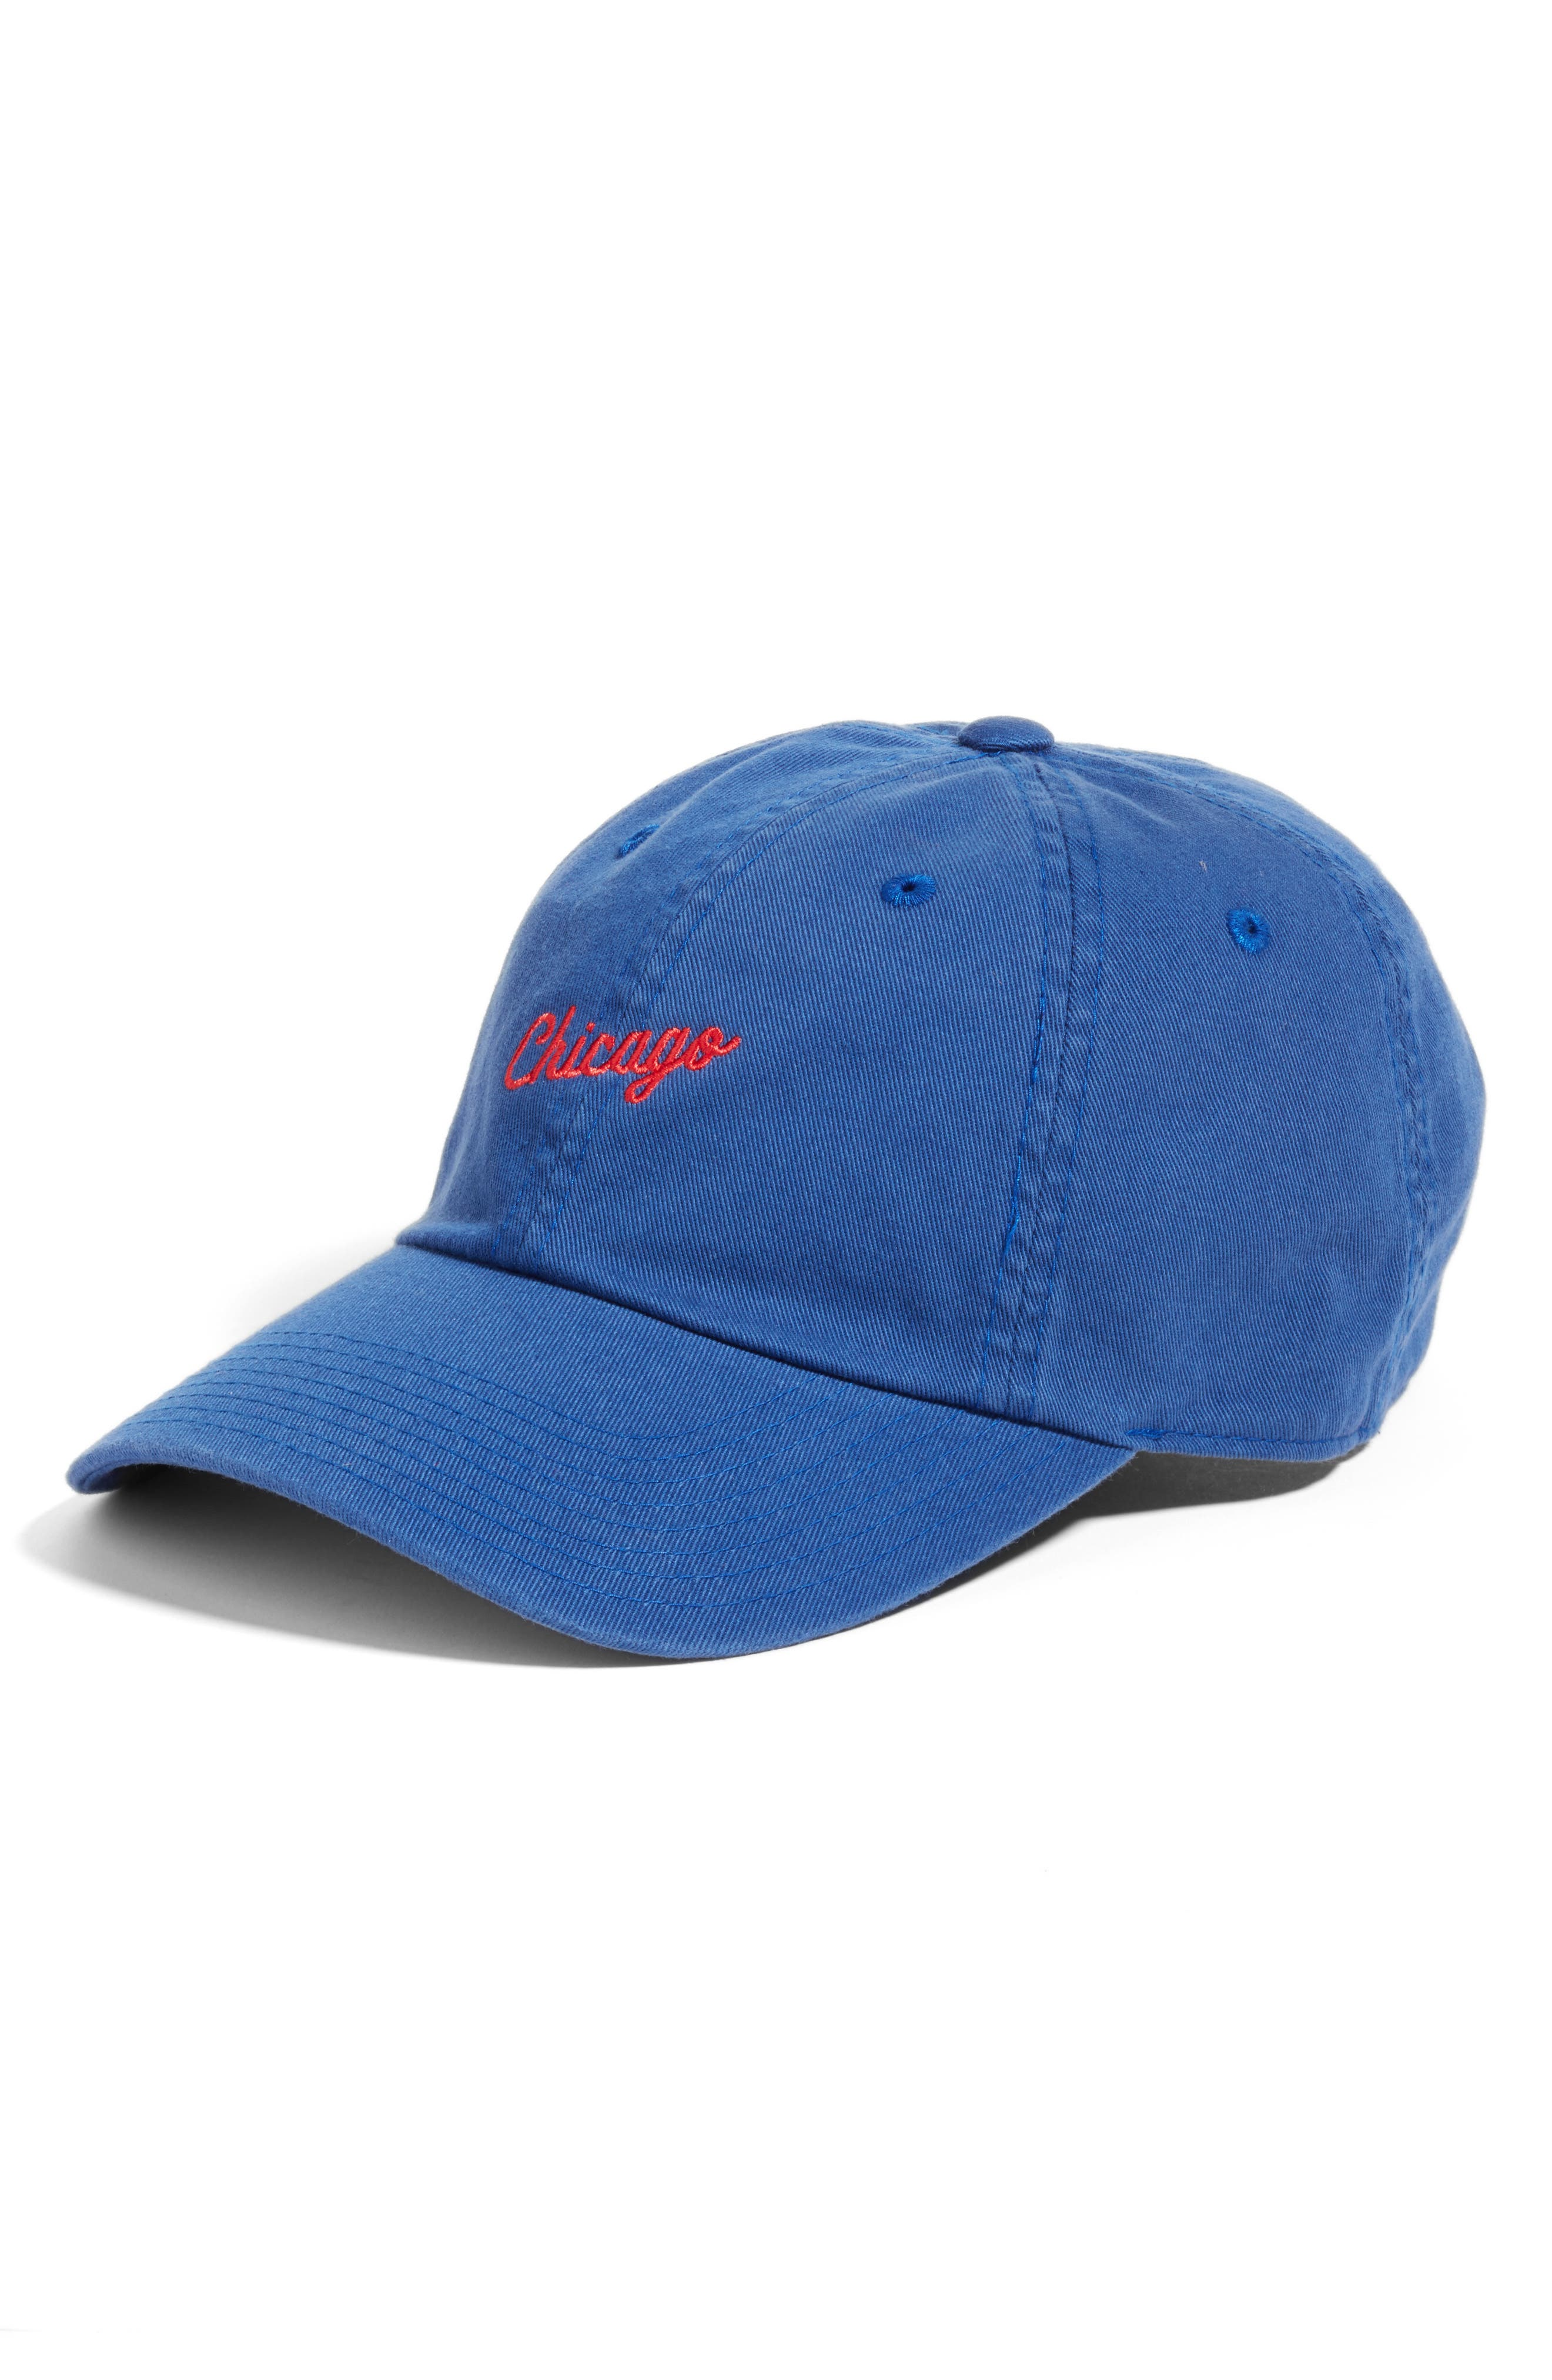 Boardshort - Chicago Baseball Cap,                             Main thumbnail 1, color,                             BAY BLUE